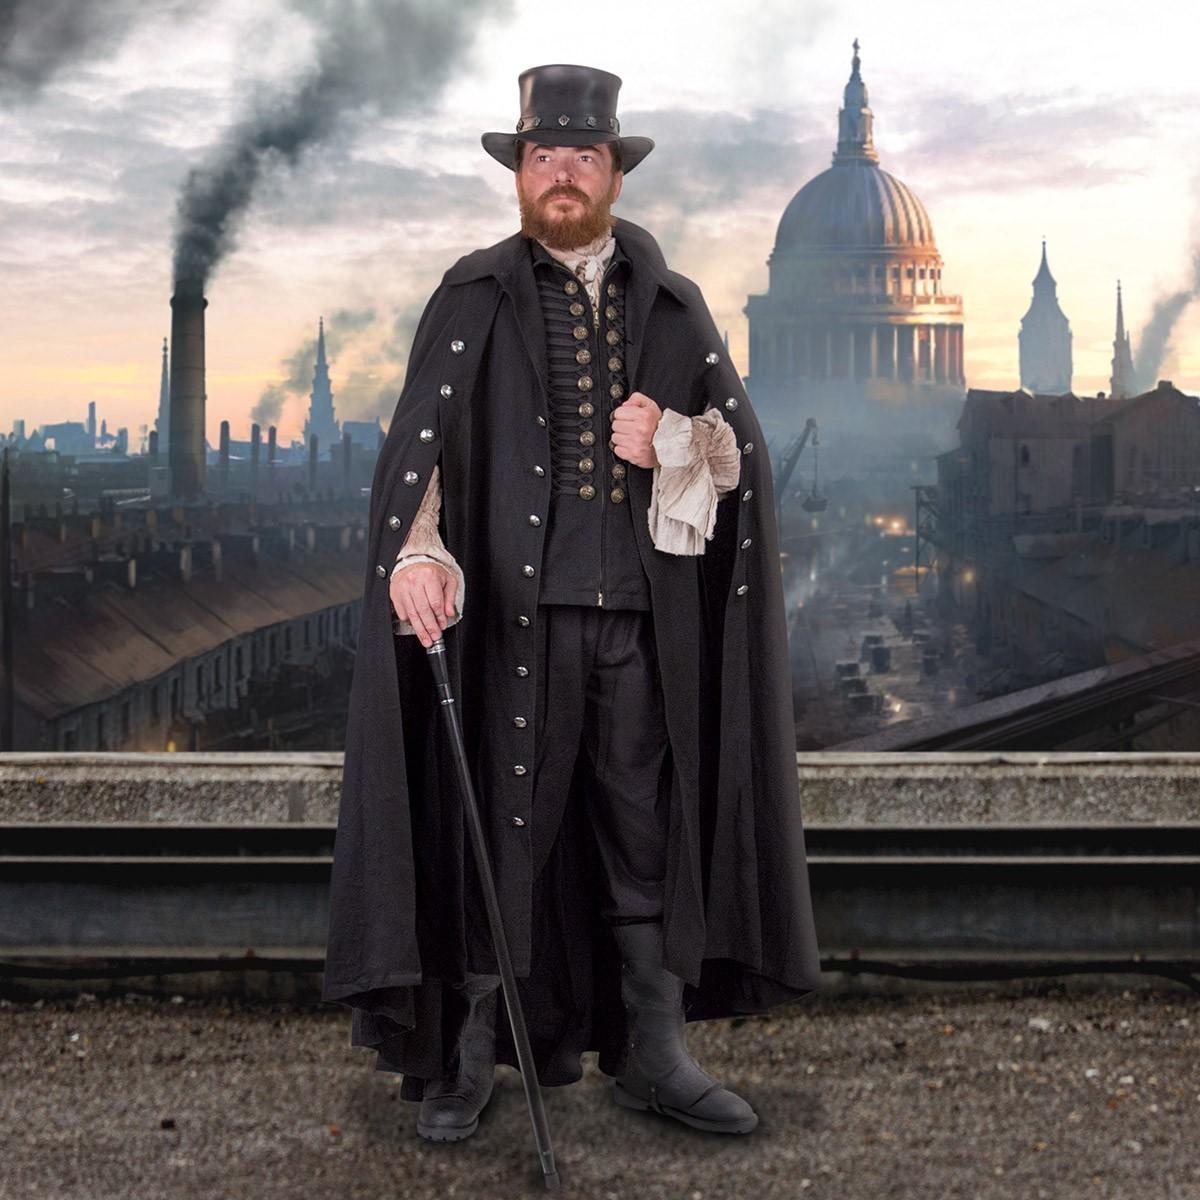 Commandant Men's Black Gothic Cloak